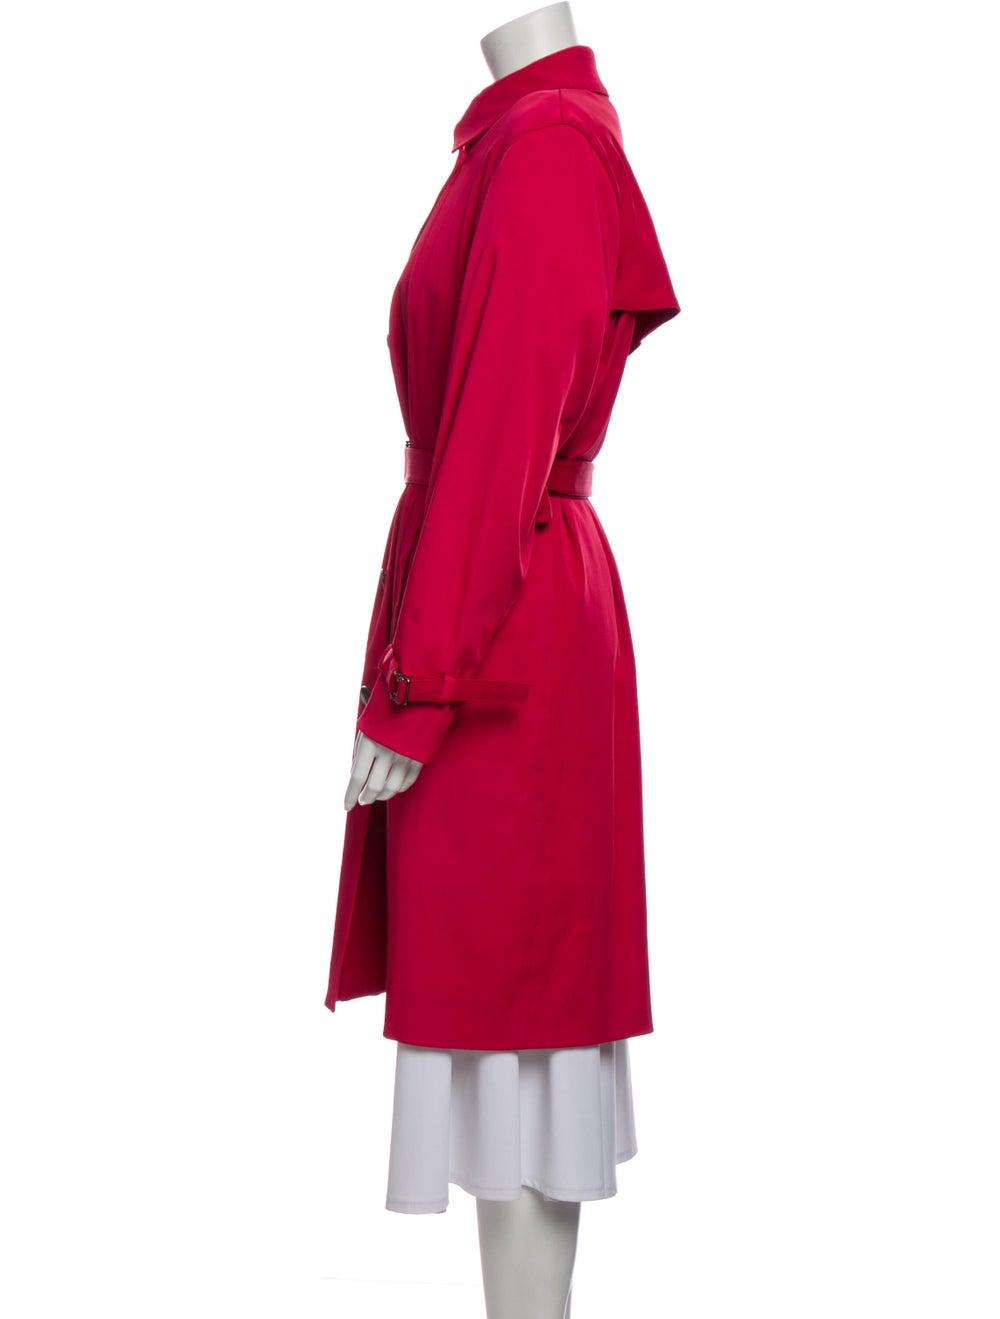 Sanyo Trench Coat Pink - image 2